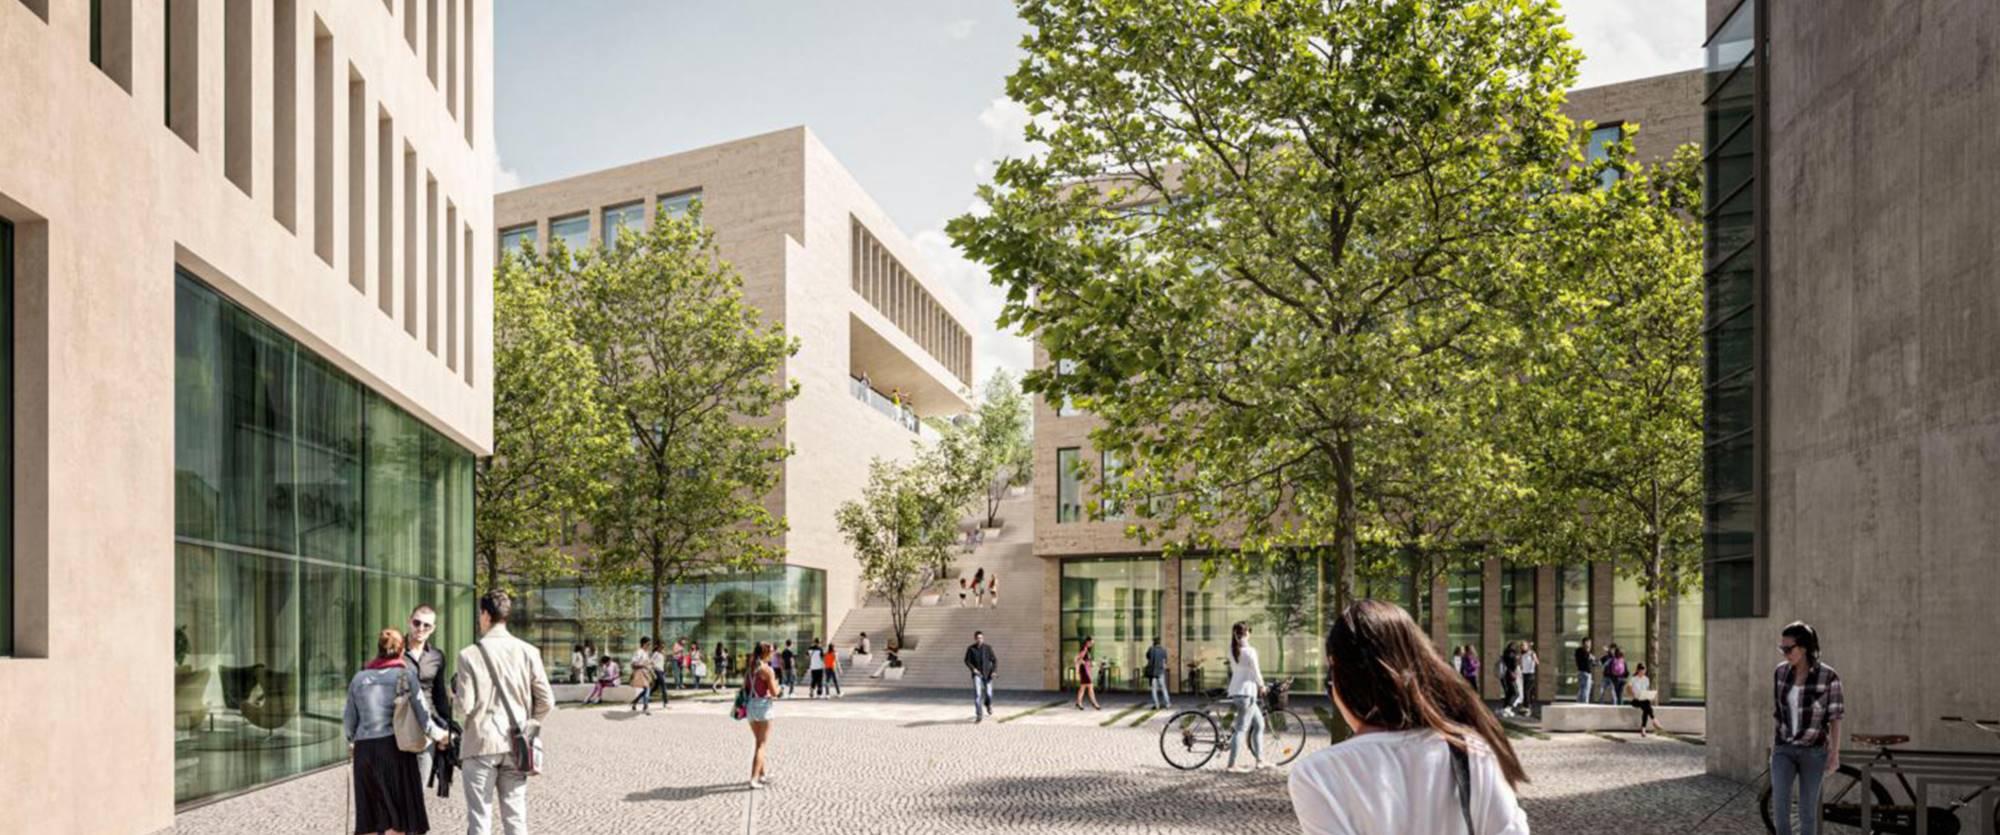 Siegen_Campus Unteres Schloss Nord_StadtSiegen2021